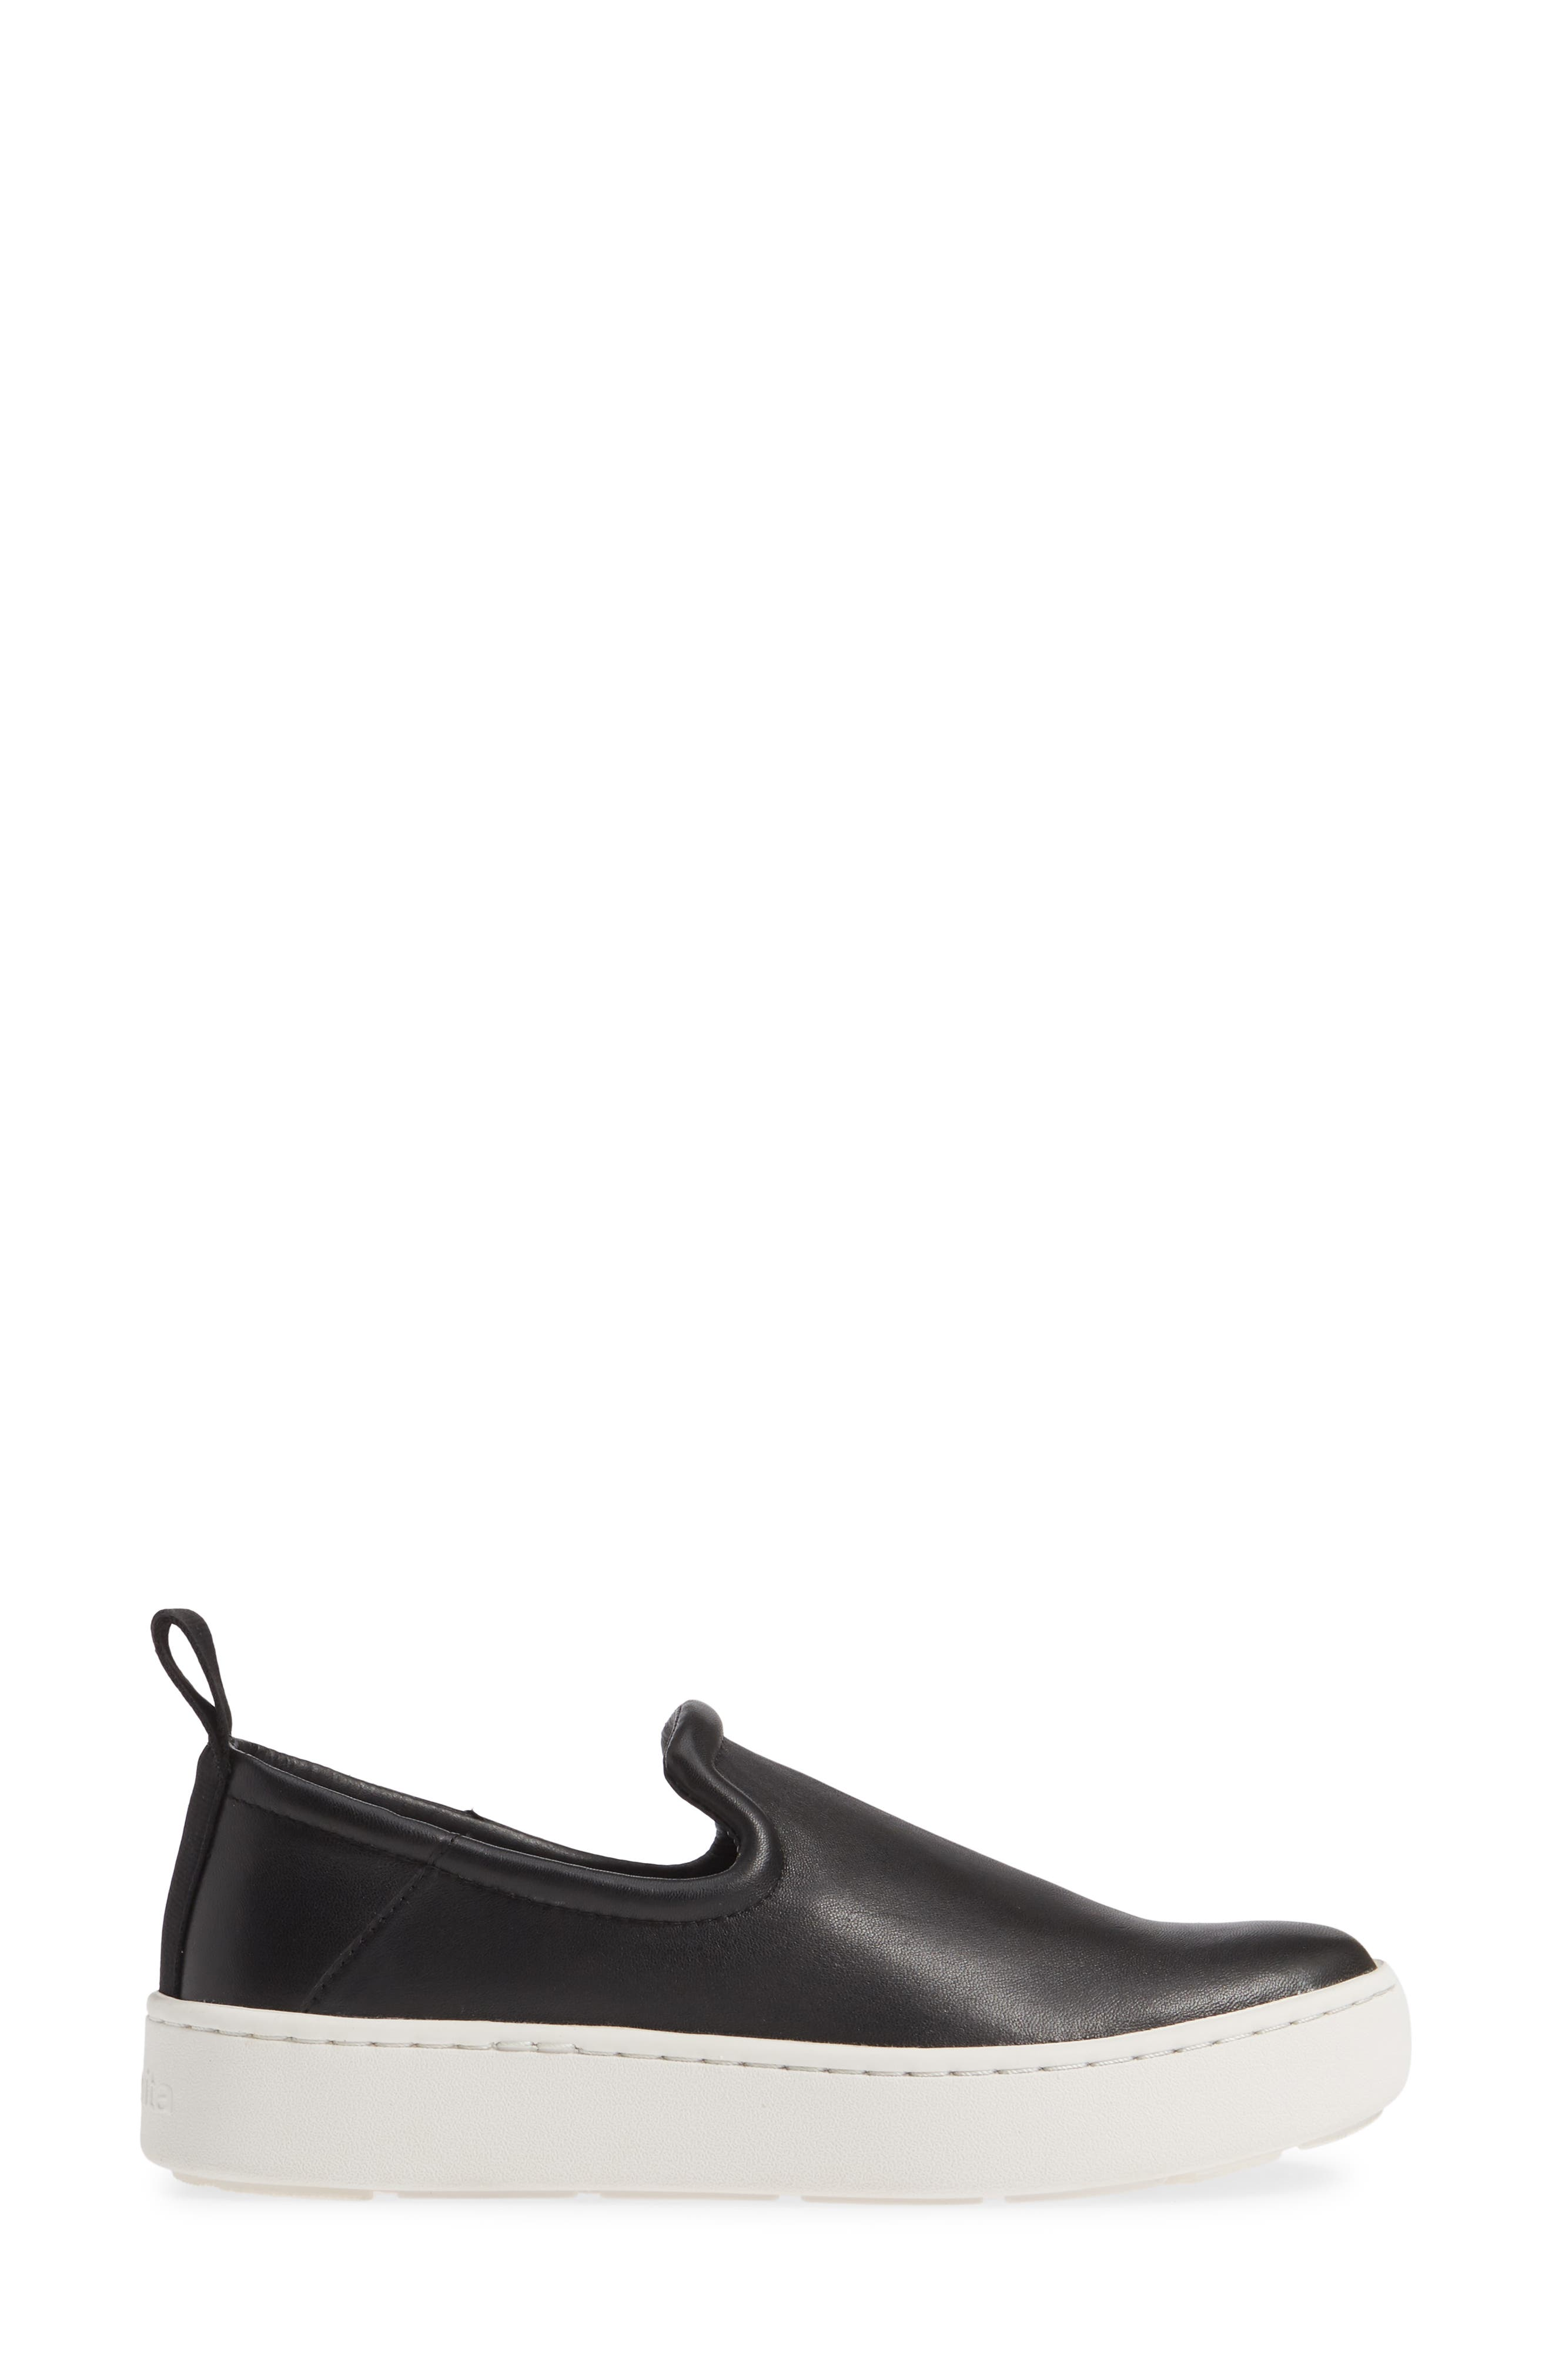 DOLCE VITA, Tag Slip-On Sneaker, Alternate thumbnail 3, color, BLACK LEATHER